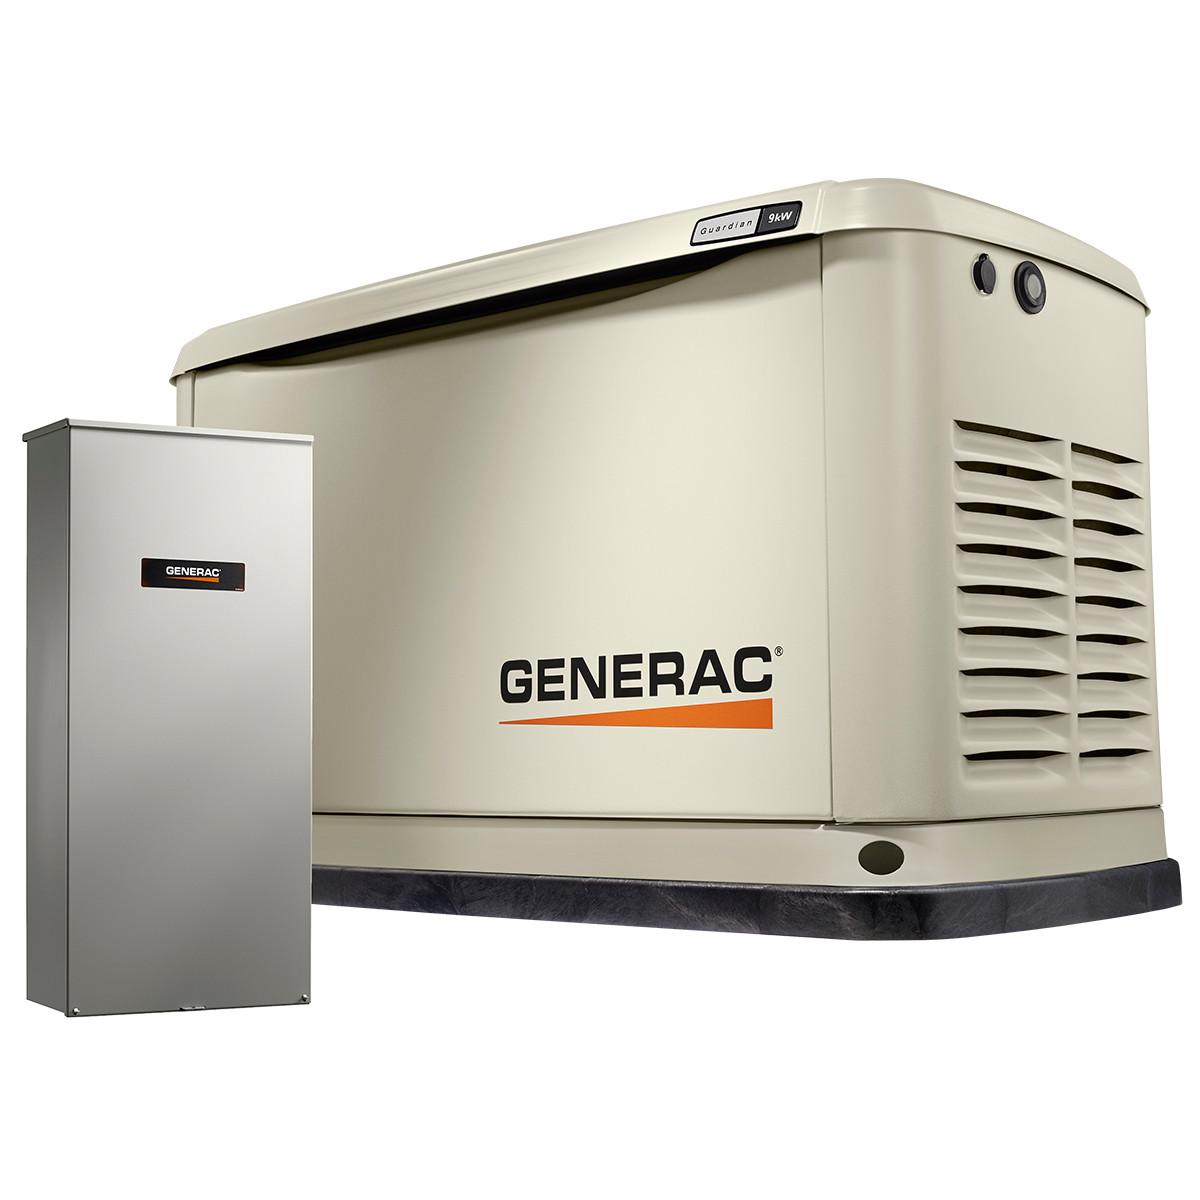 generac 7030 9kw generator 100a 16 circuit transfer switch Generac 20Kw Wiring-Diagram generac guardian 7030 9kw generator with wi fi 100a 16 circuit transfer switch